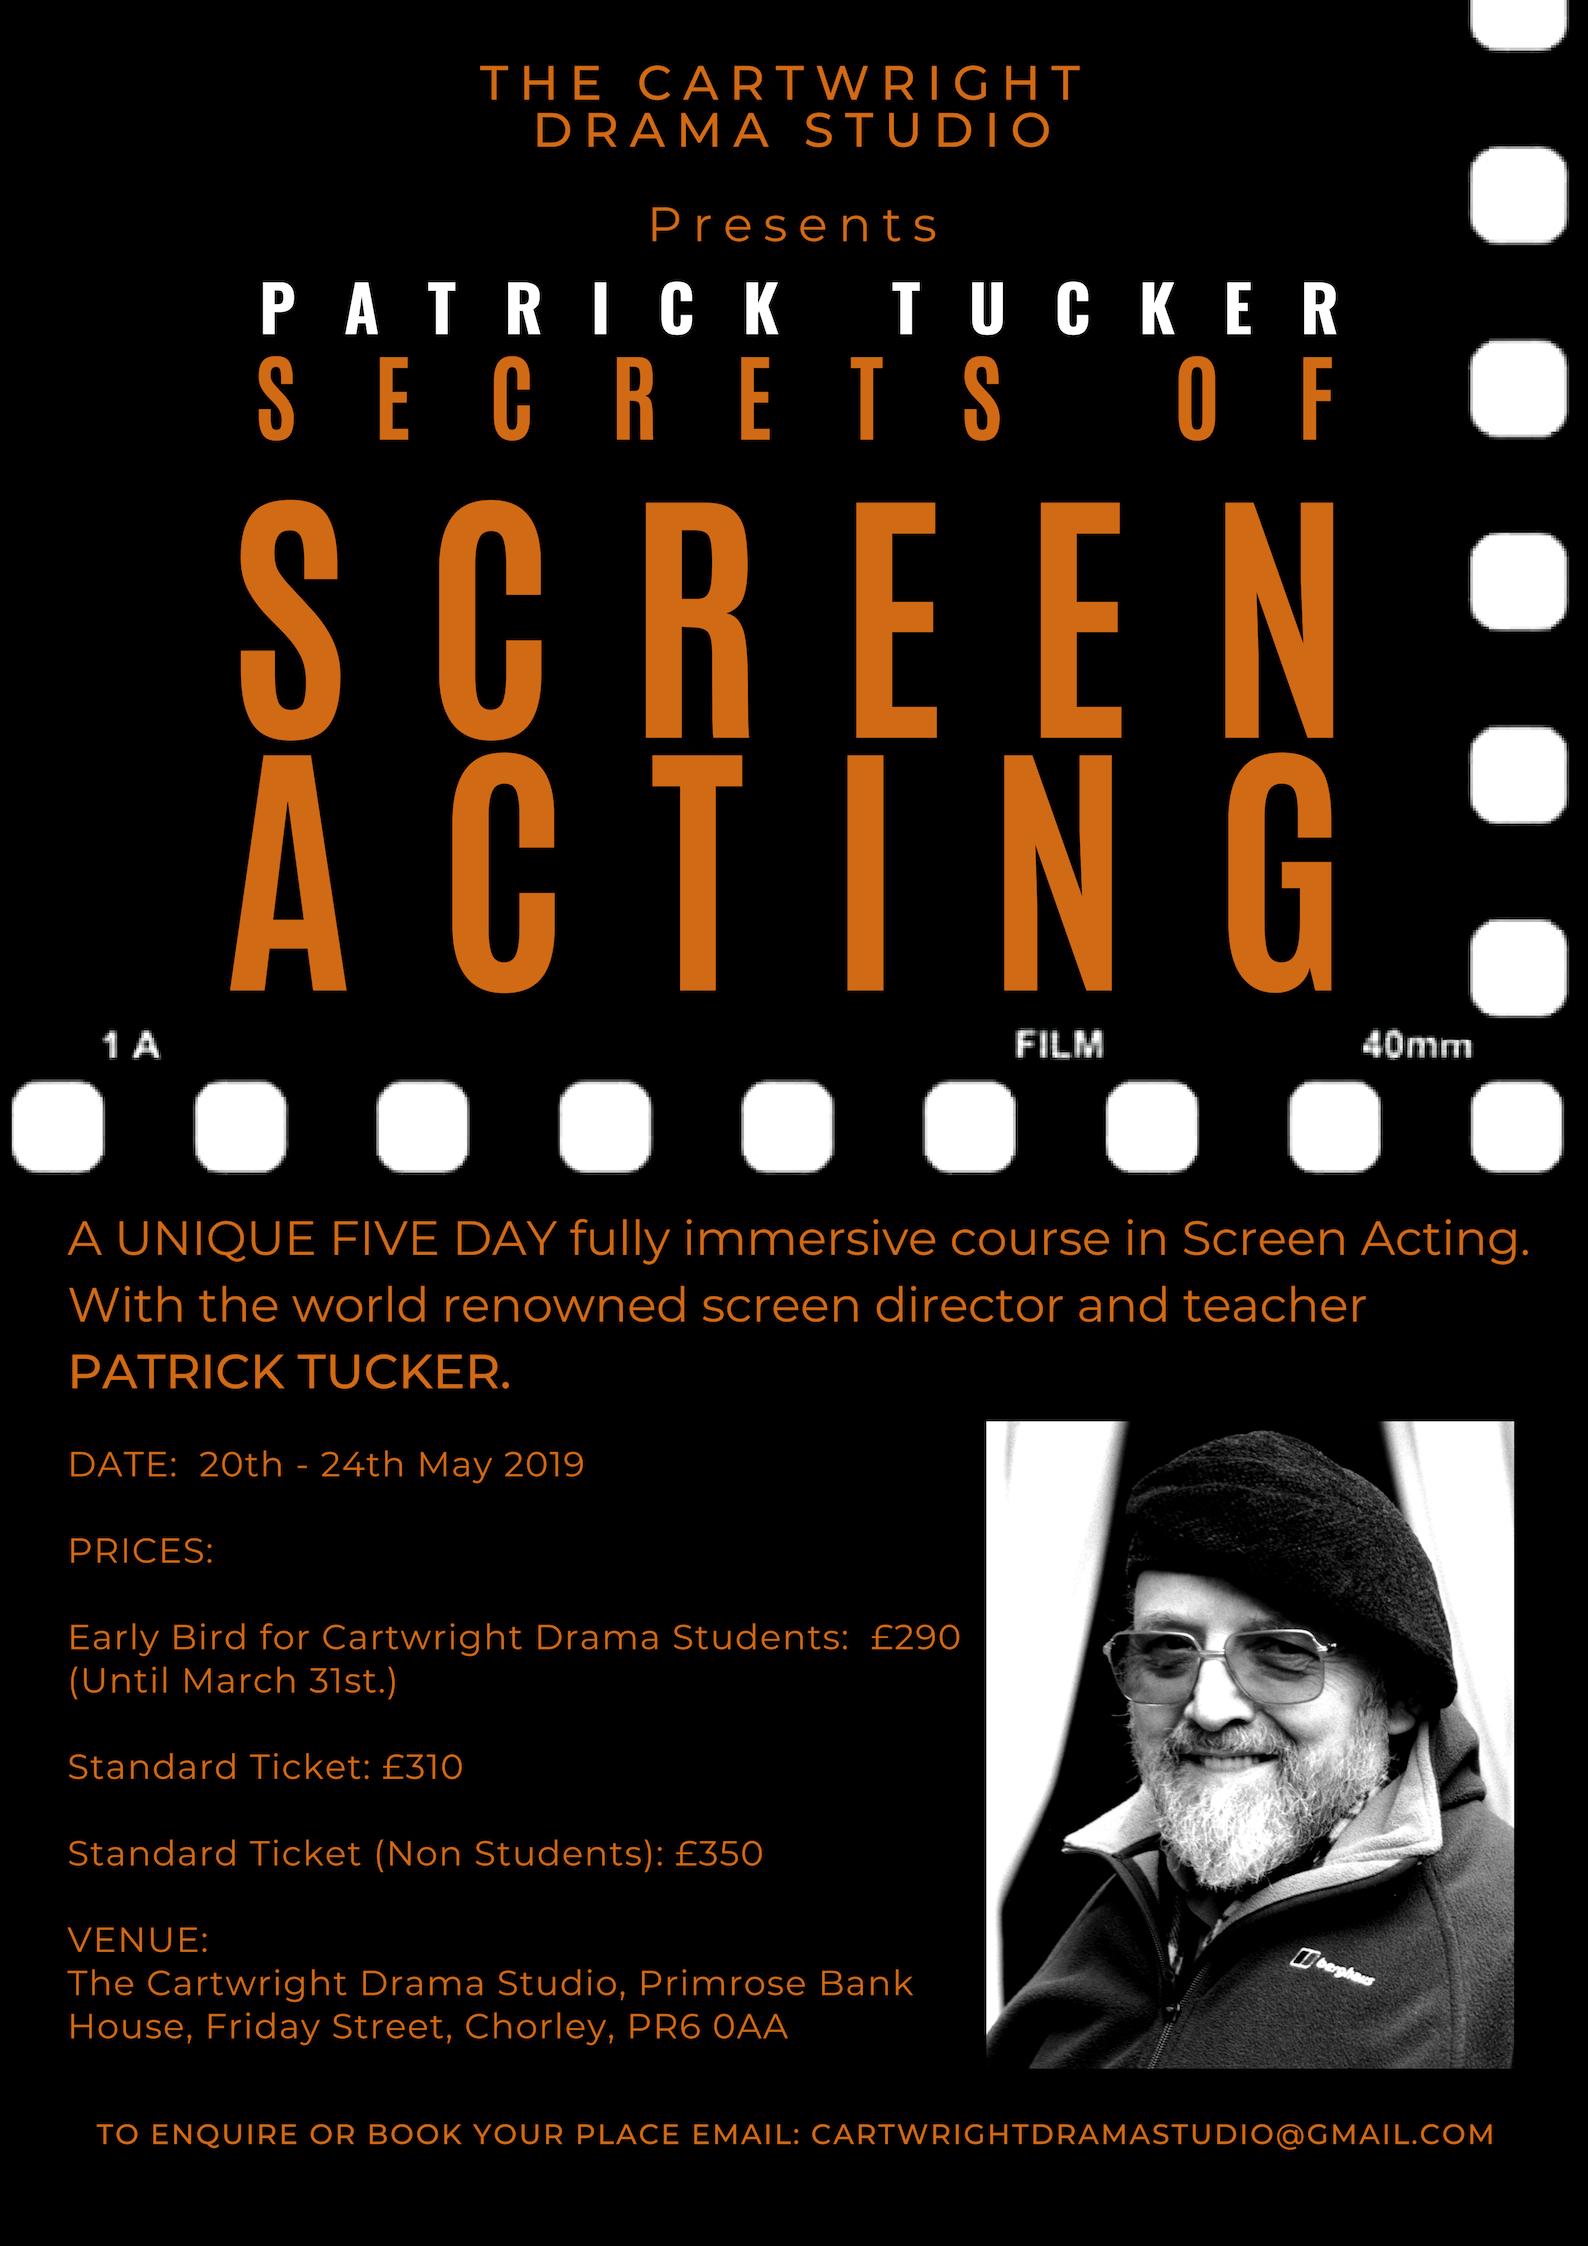 Cartwright Drama Studio Presents Secrets of Screen Acting Image 3